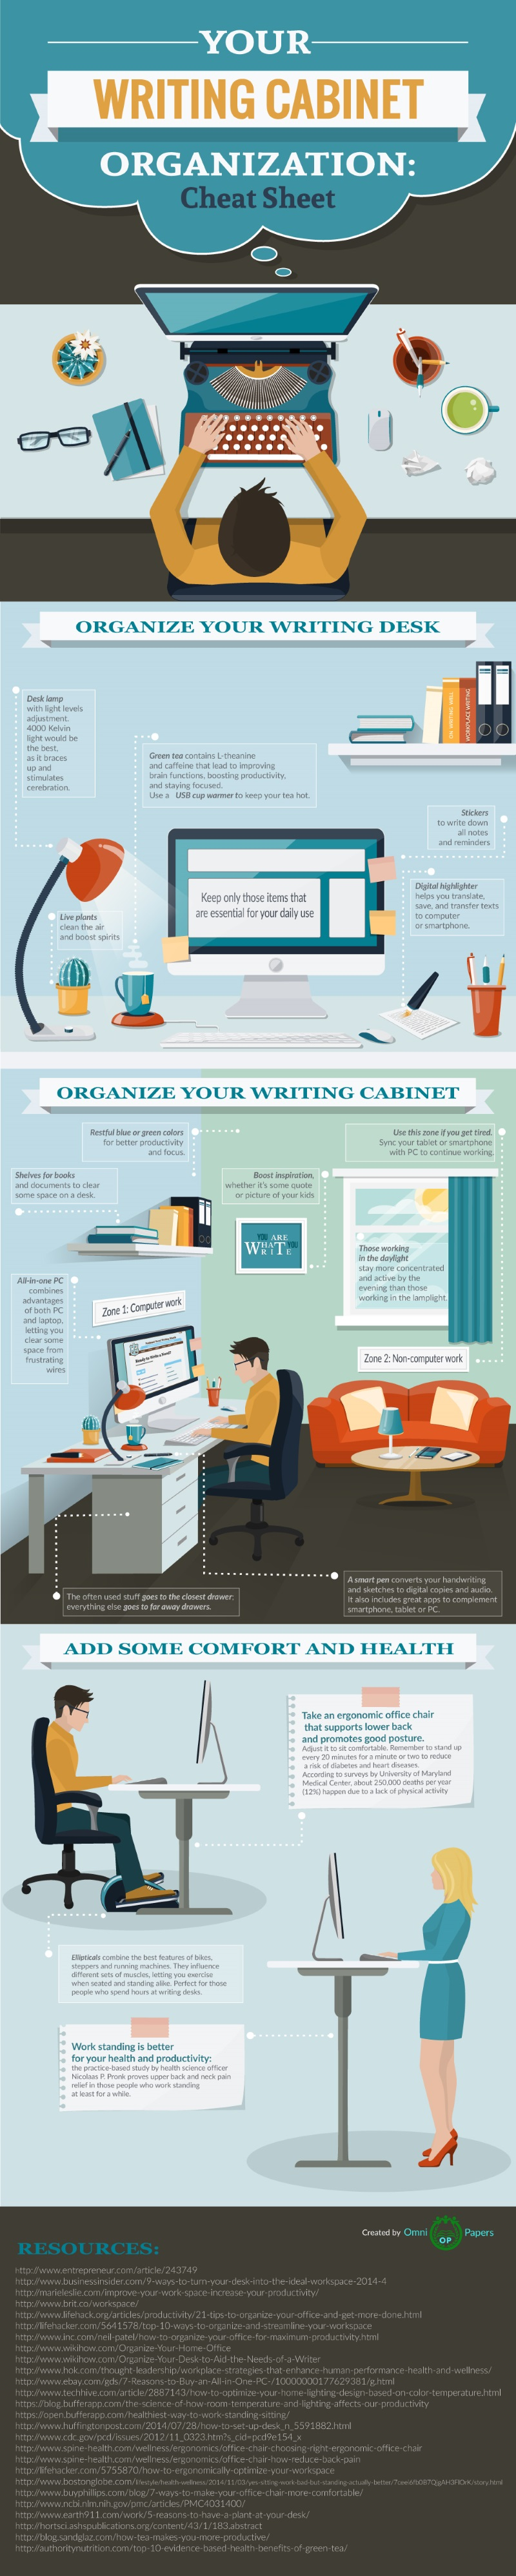 writing-cabinet